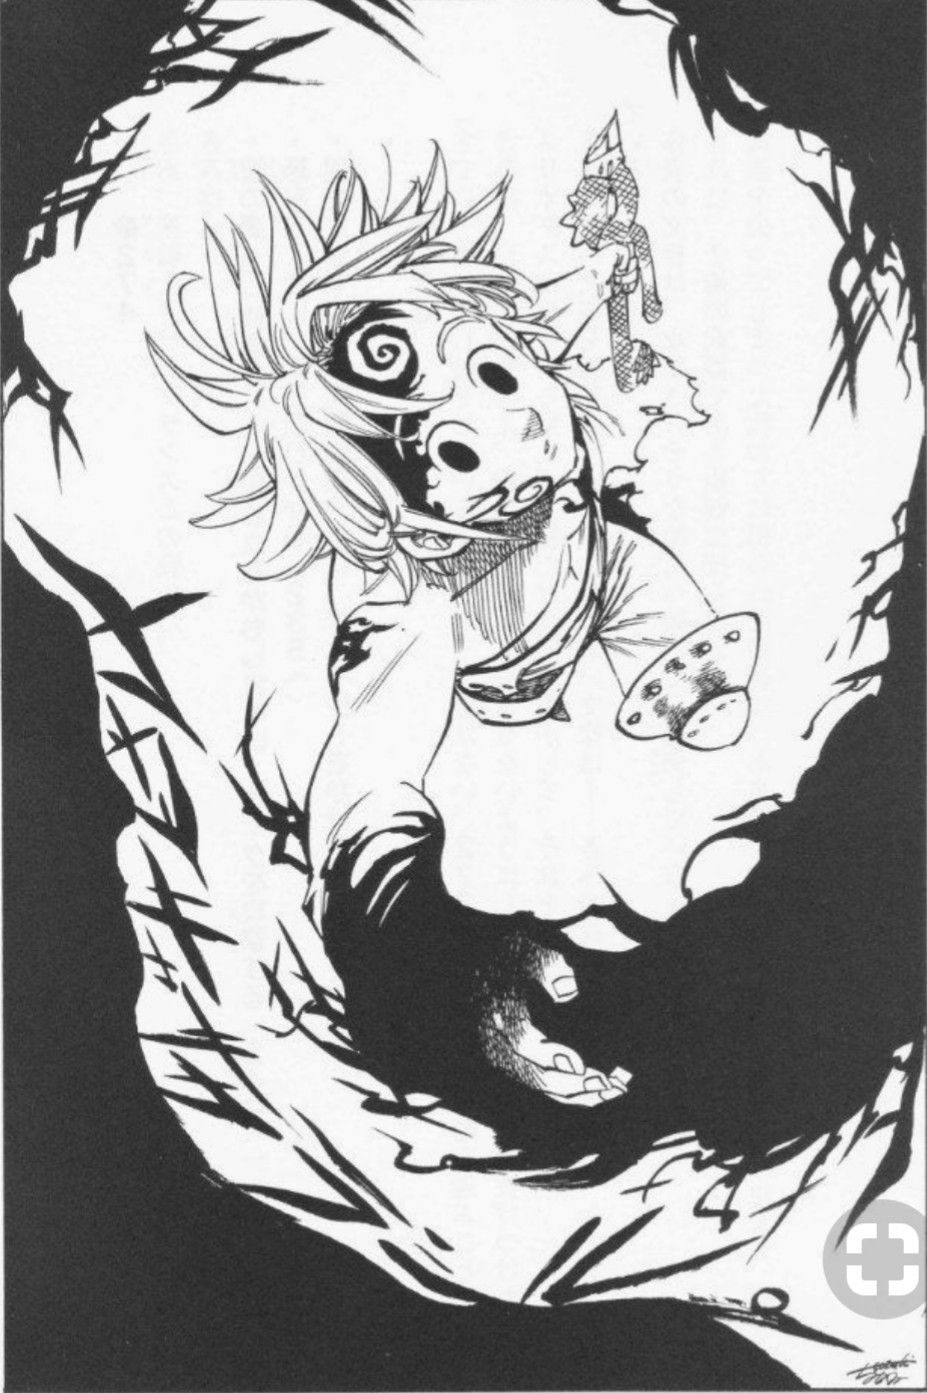 Épinglé par Katelyn Hall sur Manga Dessin manga, Croquis